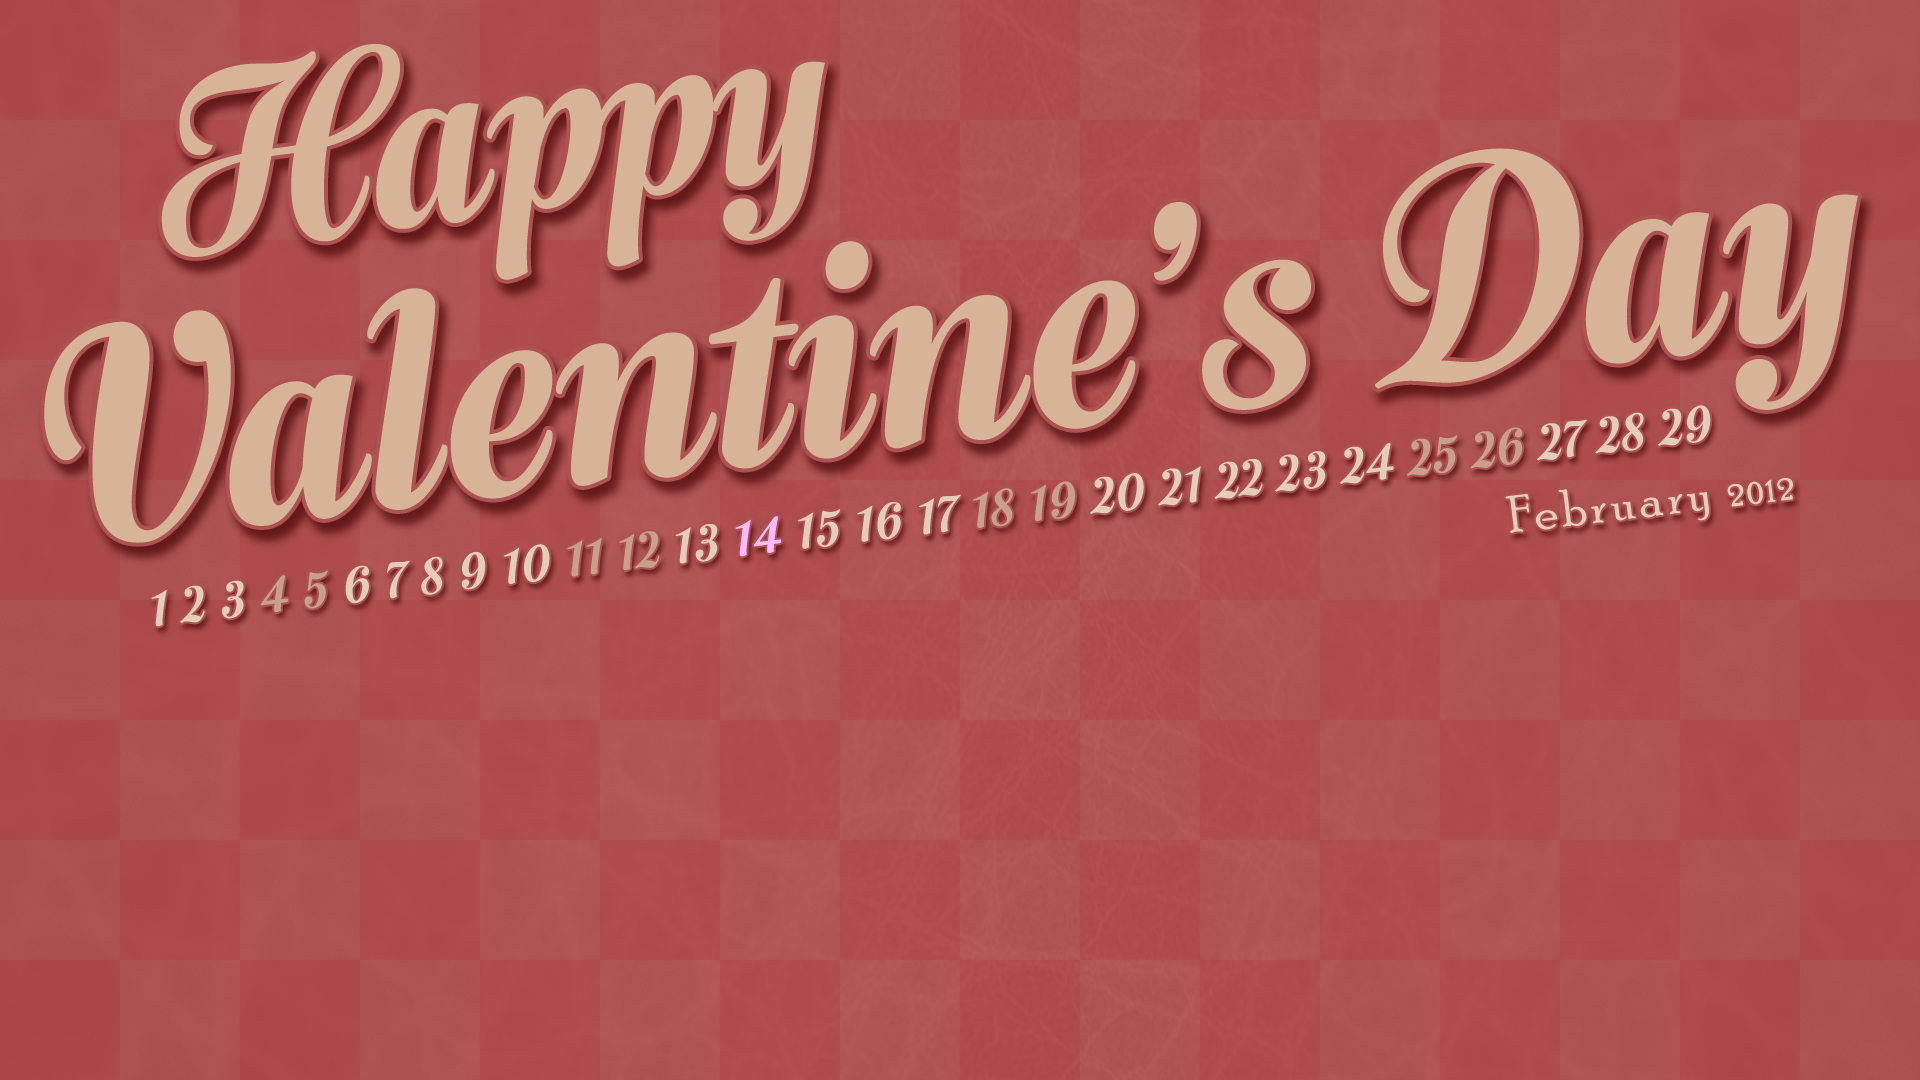 http://fc03.deviantart.net/fs71/f/2012/031/8/c/february_2012_wallpaper_calendar_by_metalfrog-d4o9dd9.jpg